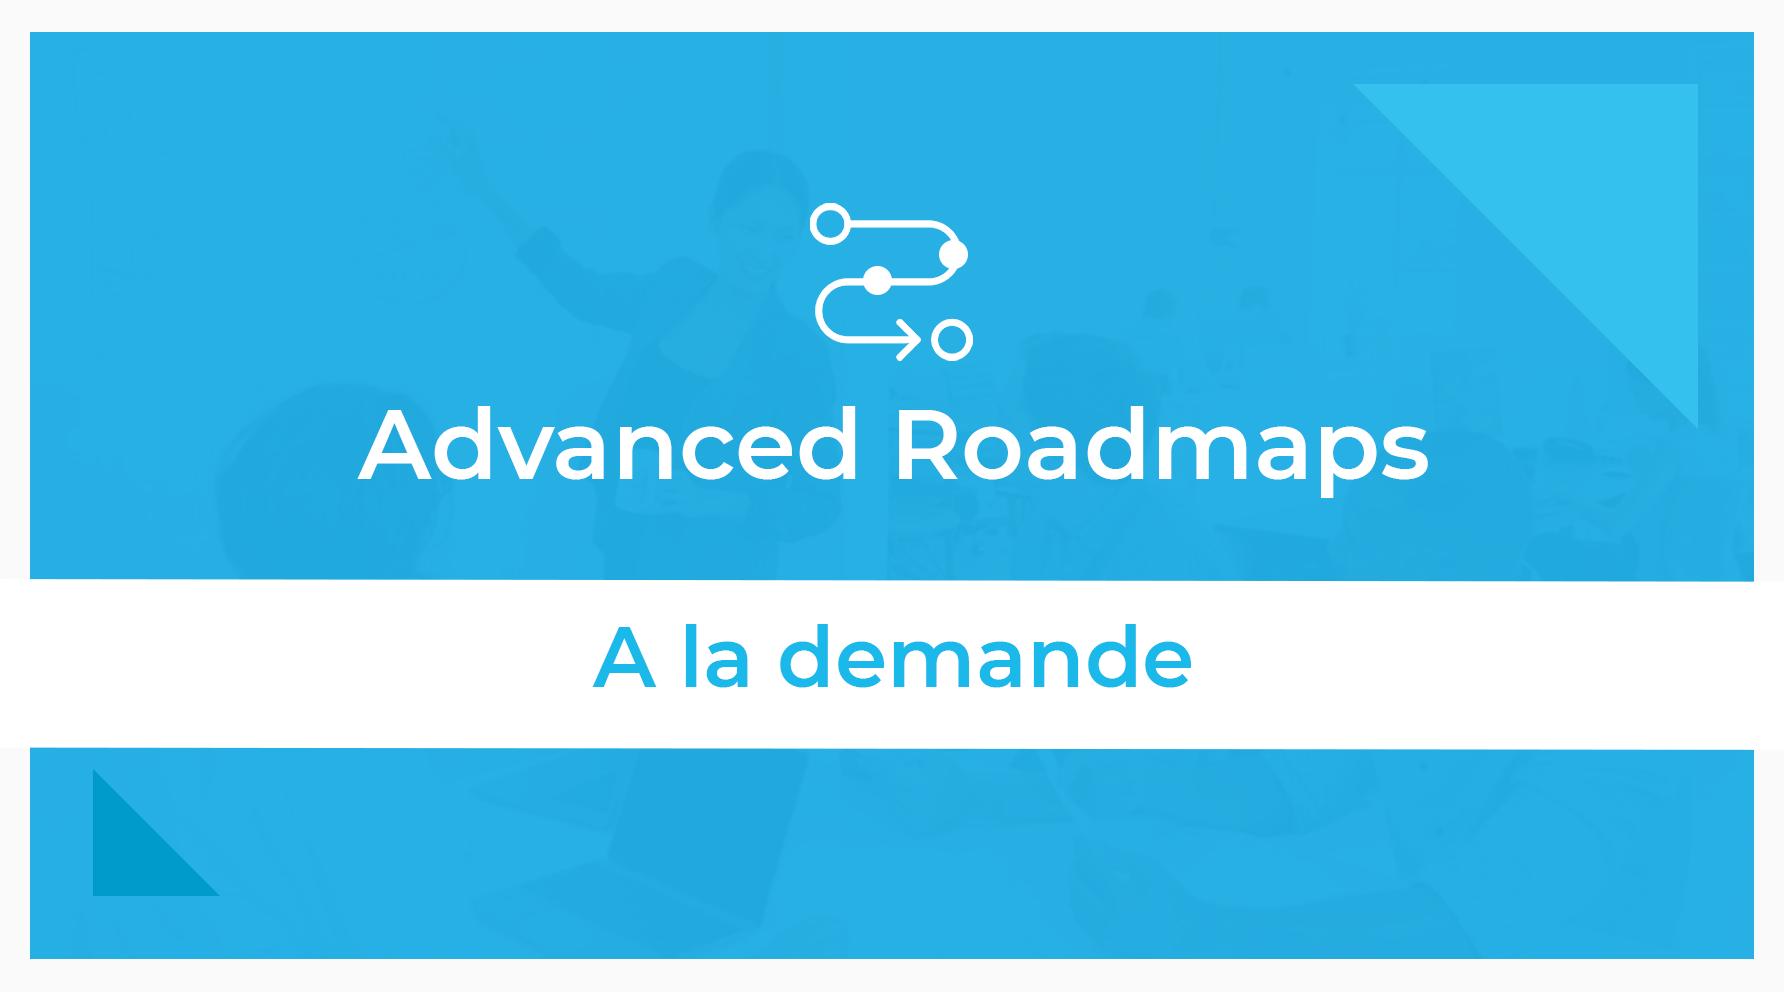 Advanced Roadmaps à la demande formation